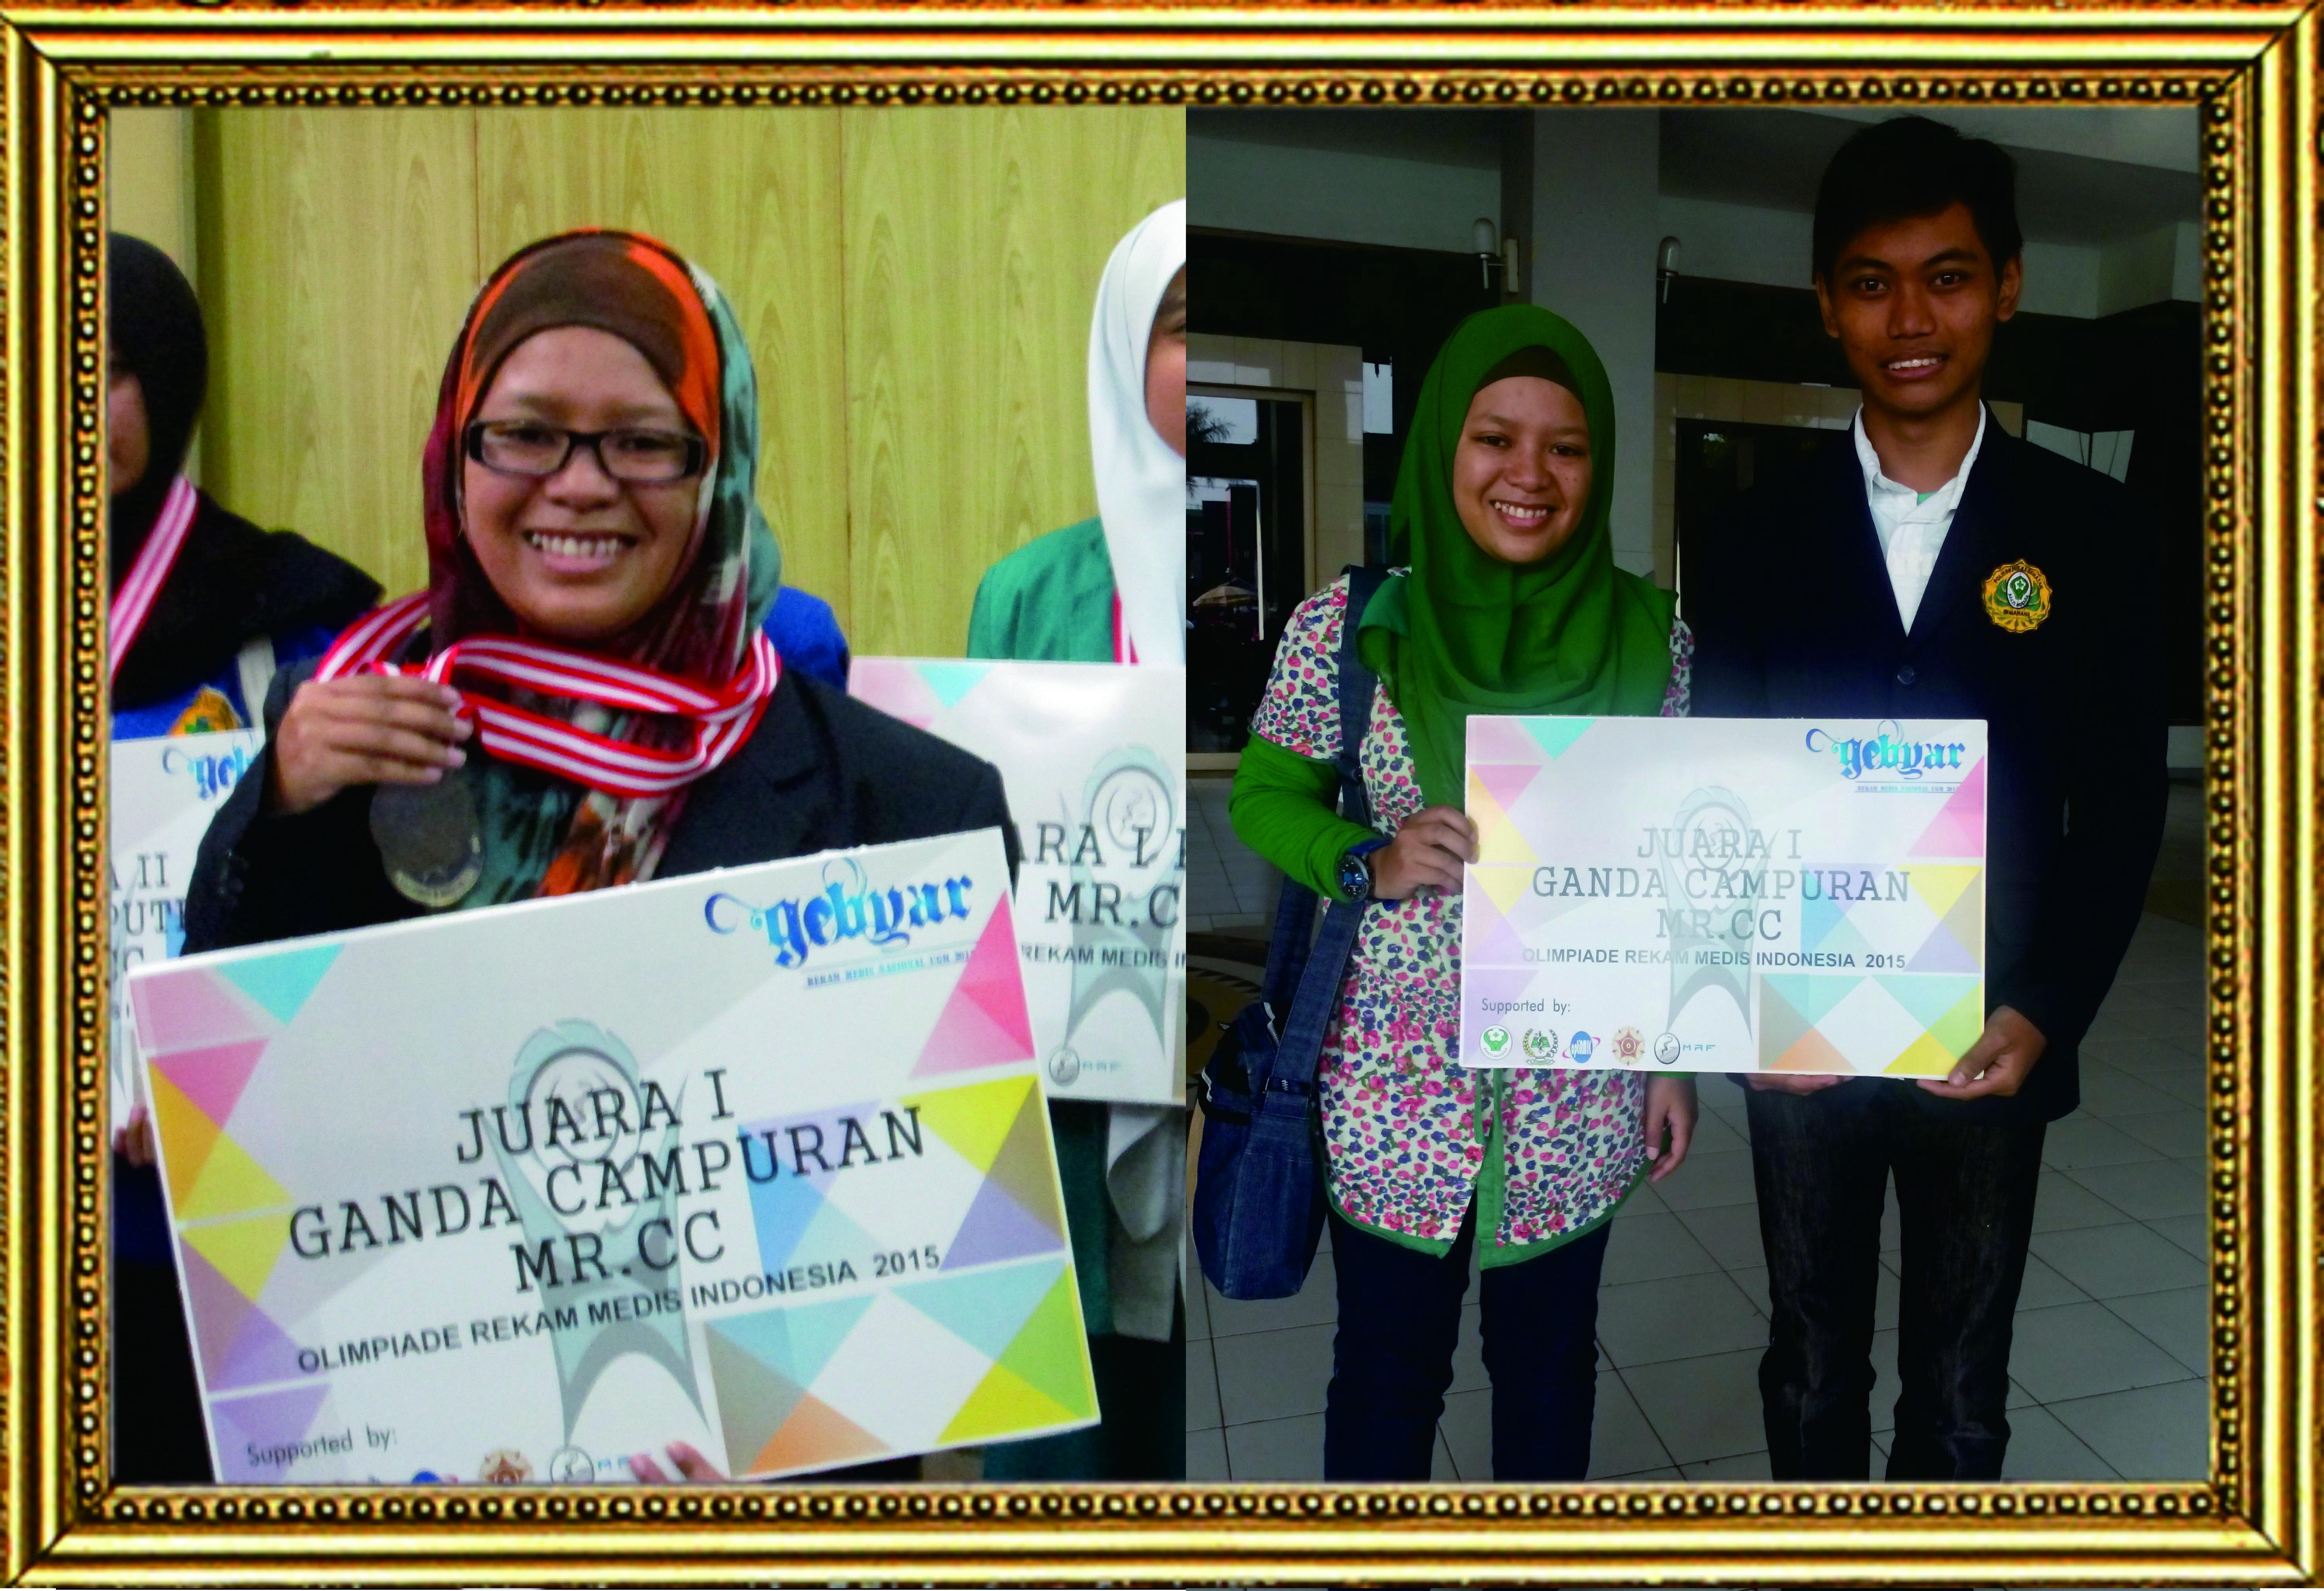 Juara 1 Ganda Campuran Medical Record Coding Competition (MR.CC) Olimpiade Rekam Medis INdonesia (ORI) 2015